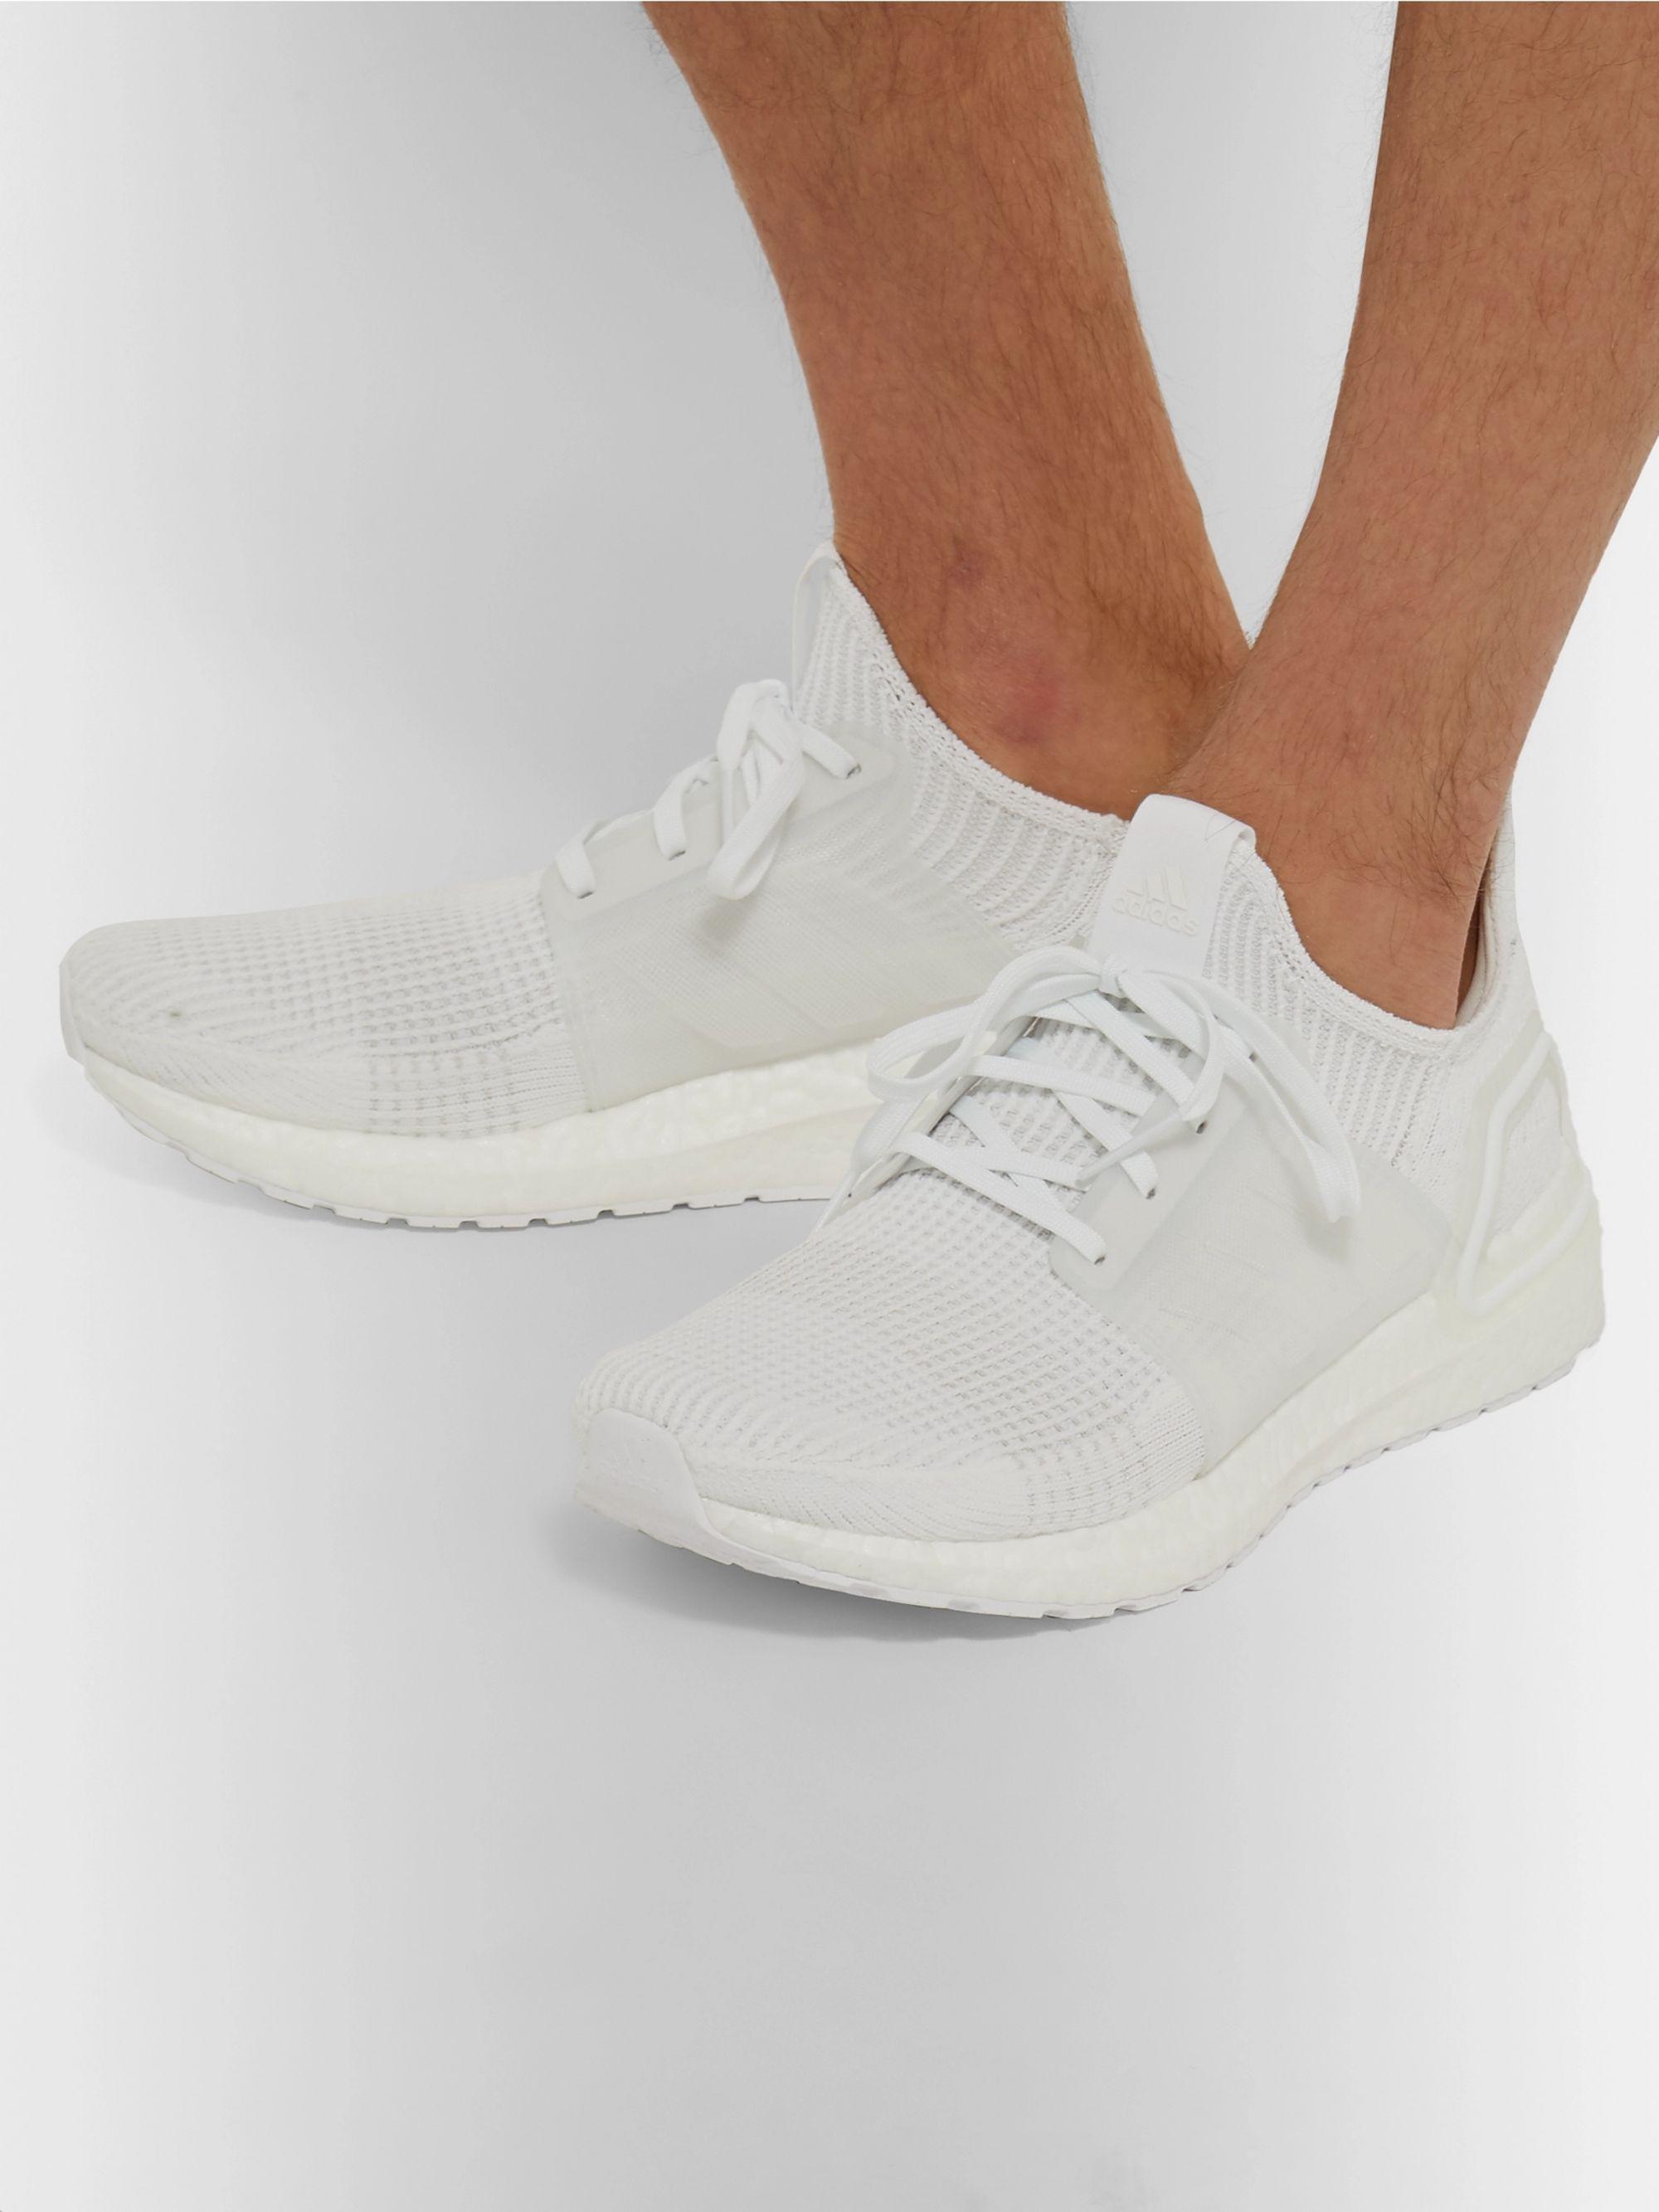 adidas Originals Men White UltraBoost 19 Sneakers